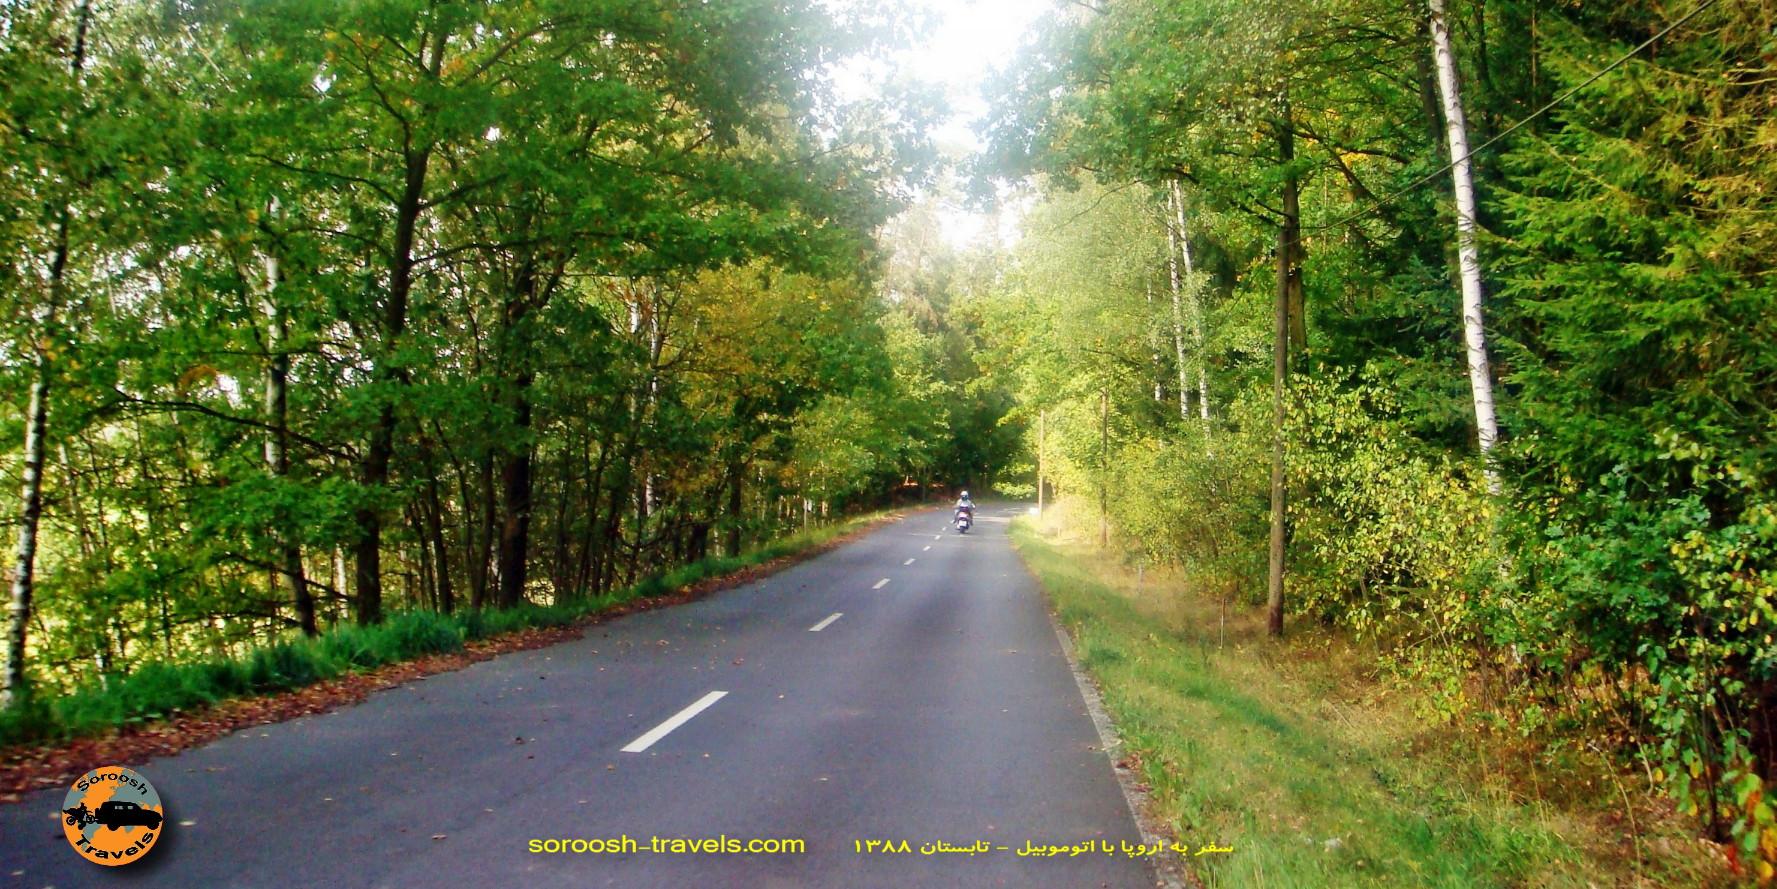 31-shahrivar-1388-22-september-2009-ludwigsburg-in-germany-to-prague-4